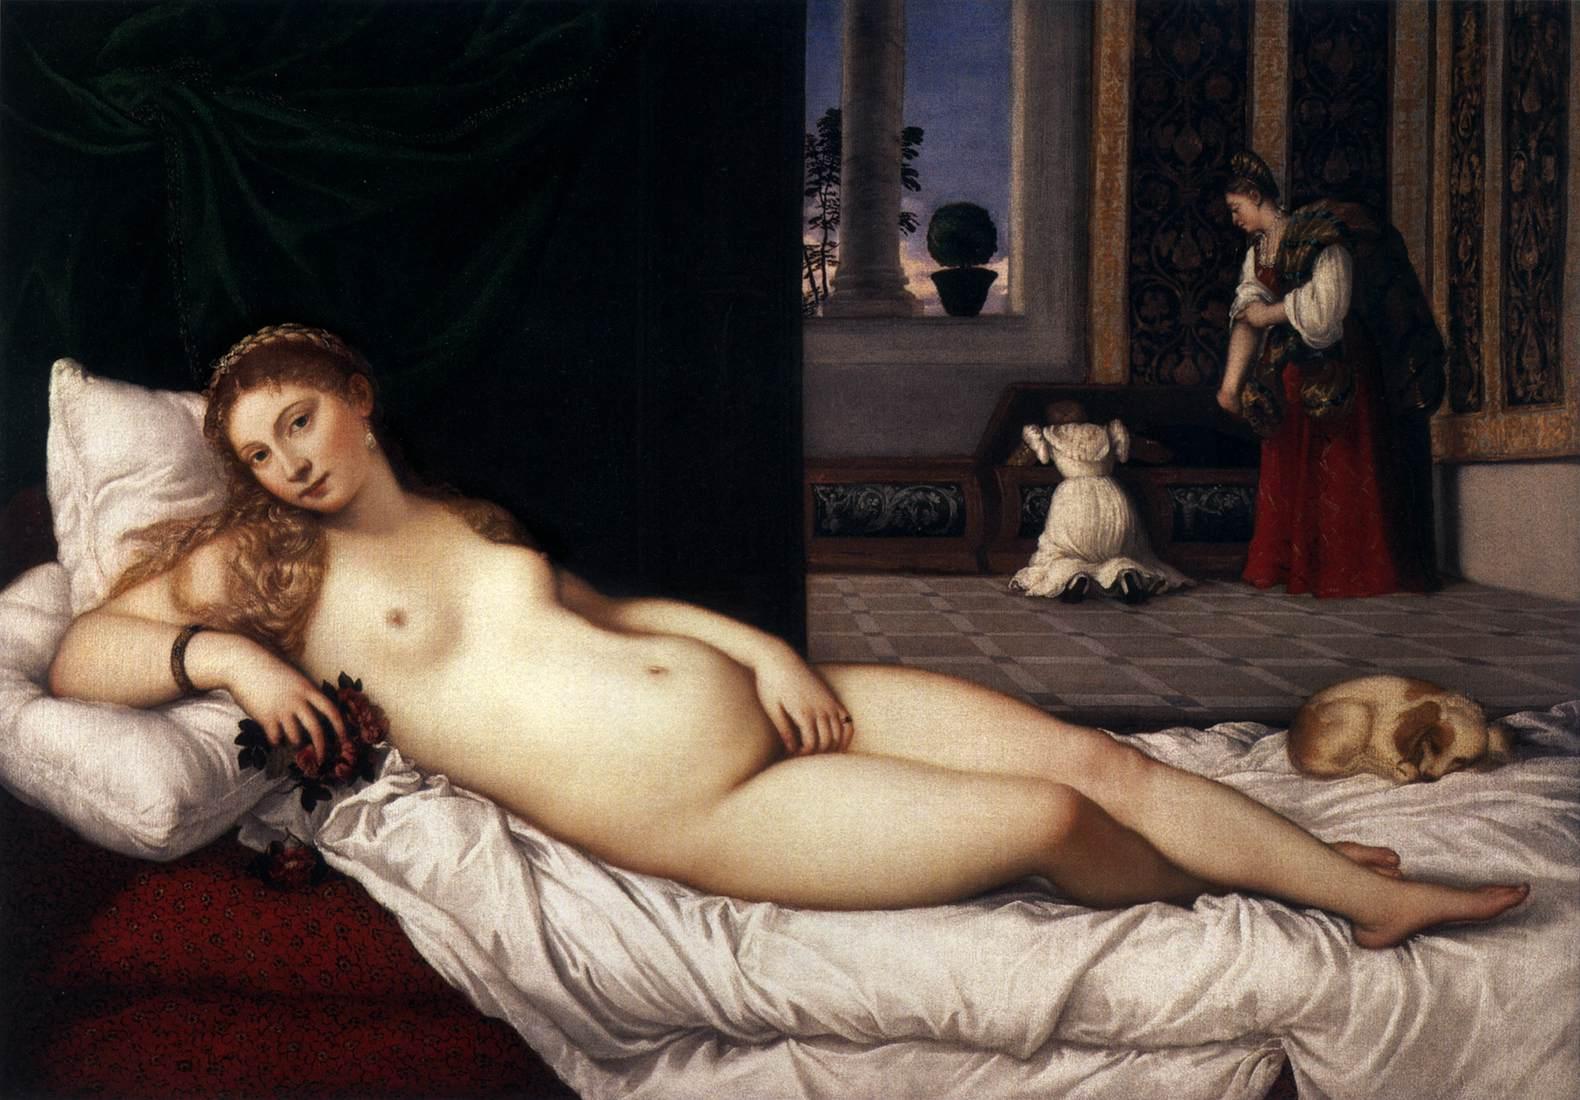 Vénus d'Urbino, du Titien, Galleria degli Uffizi, Florence, avant 1538 (source : wga)